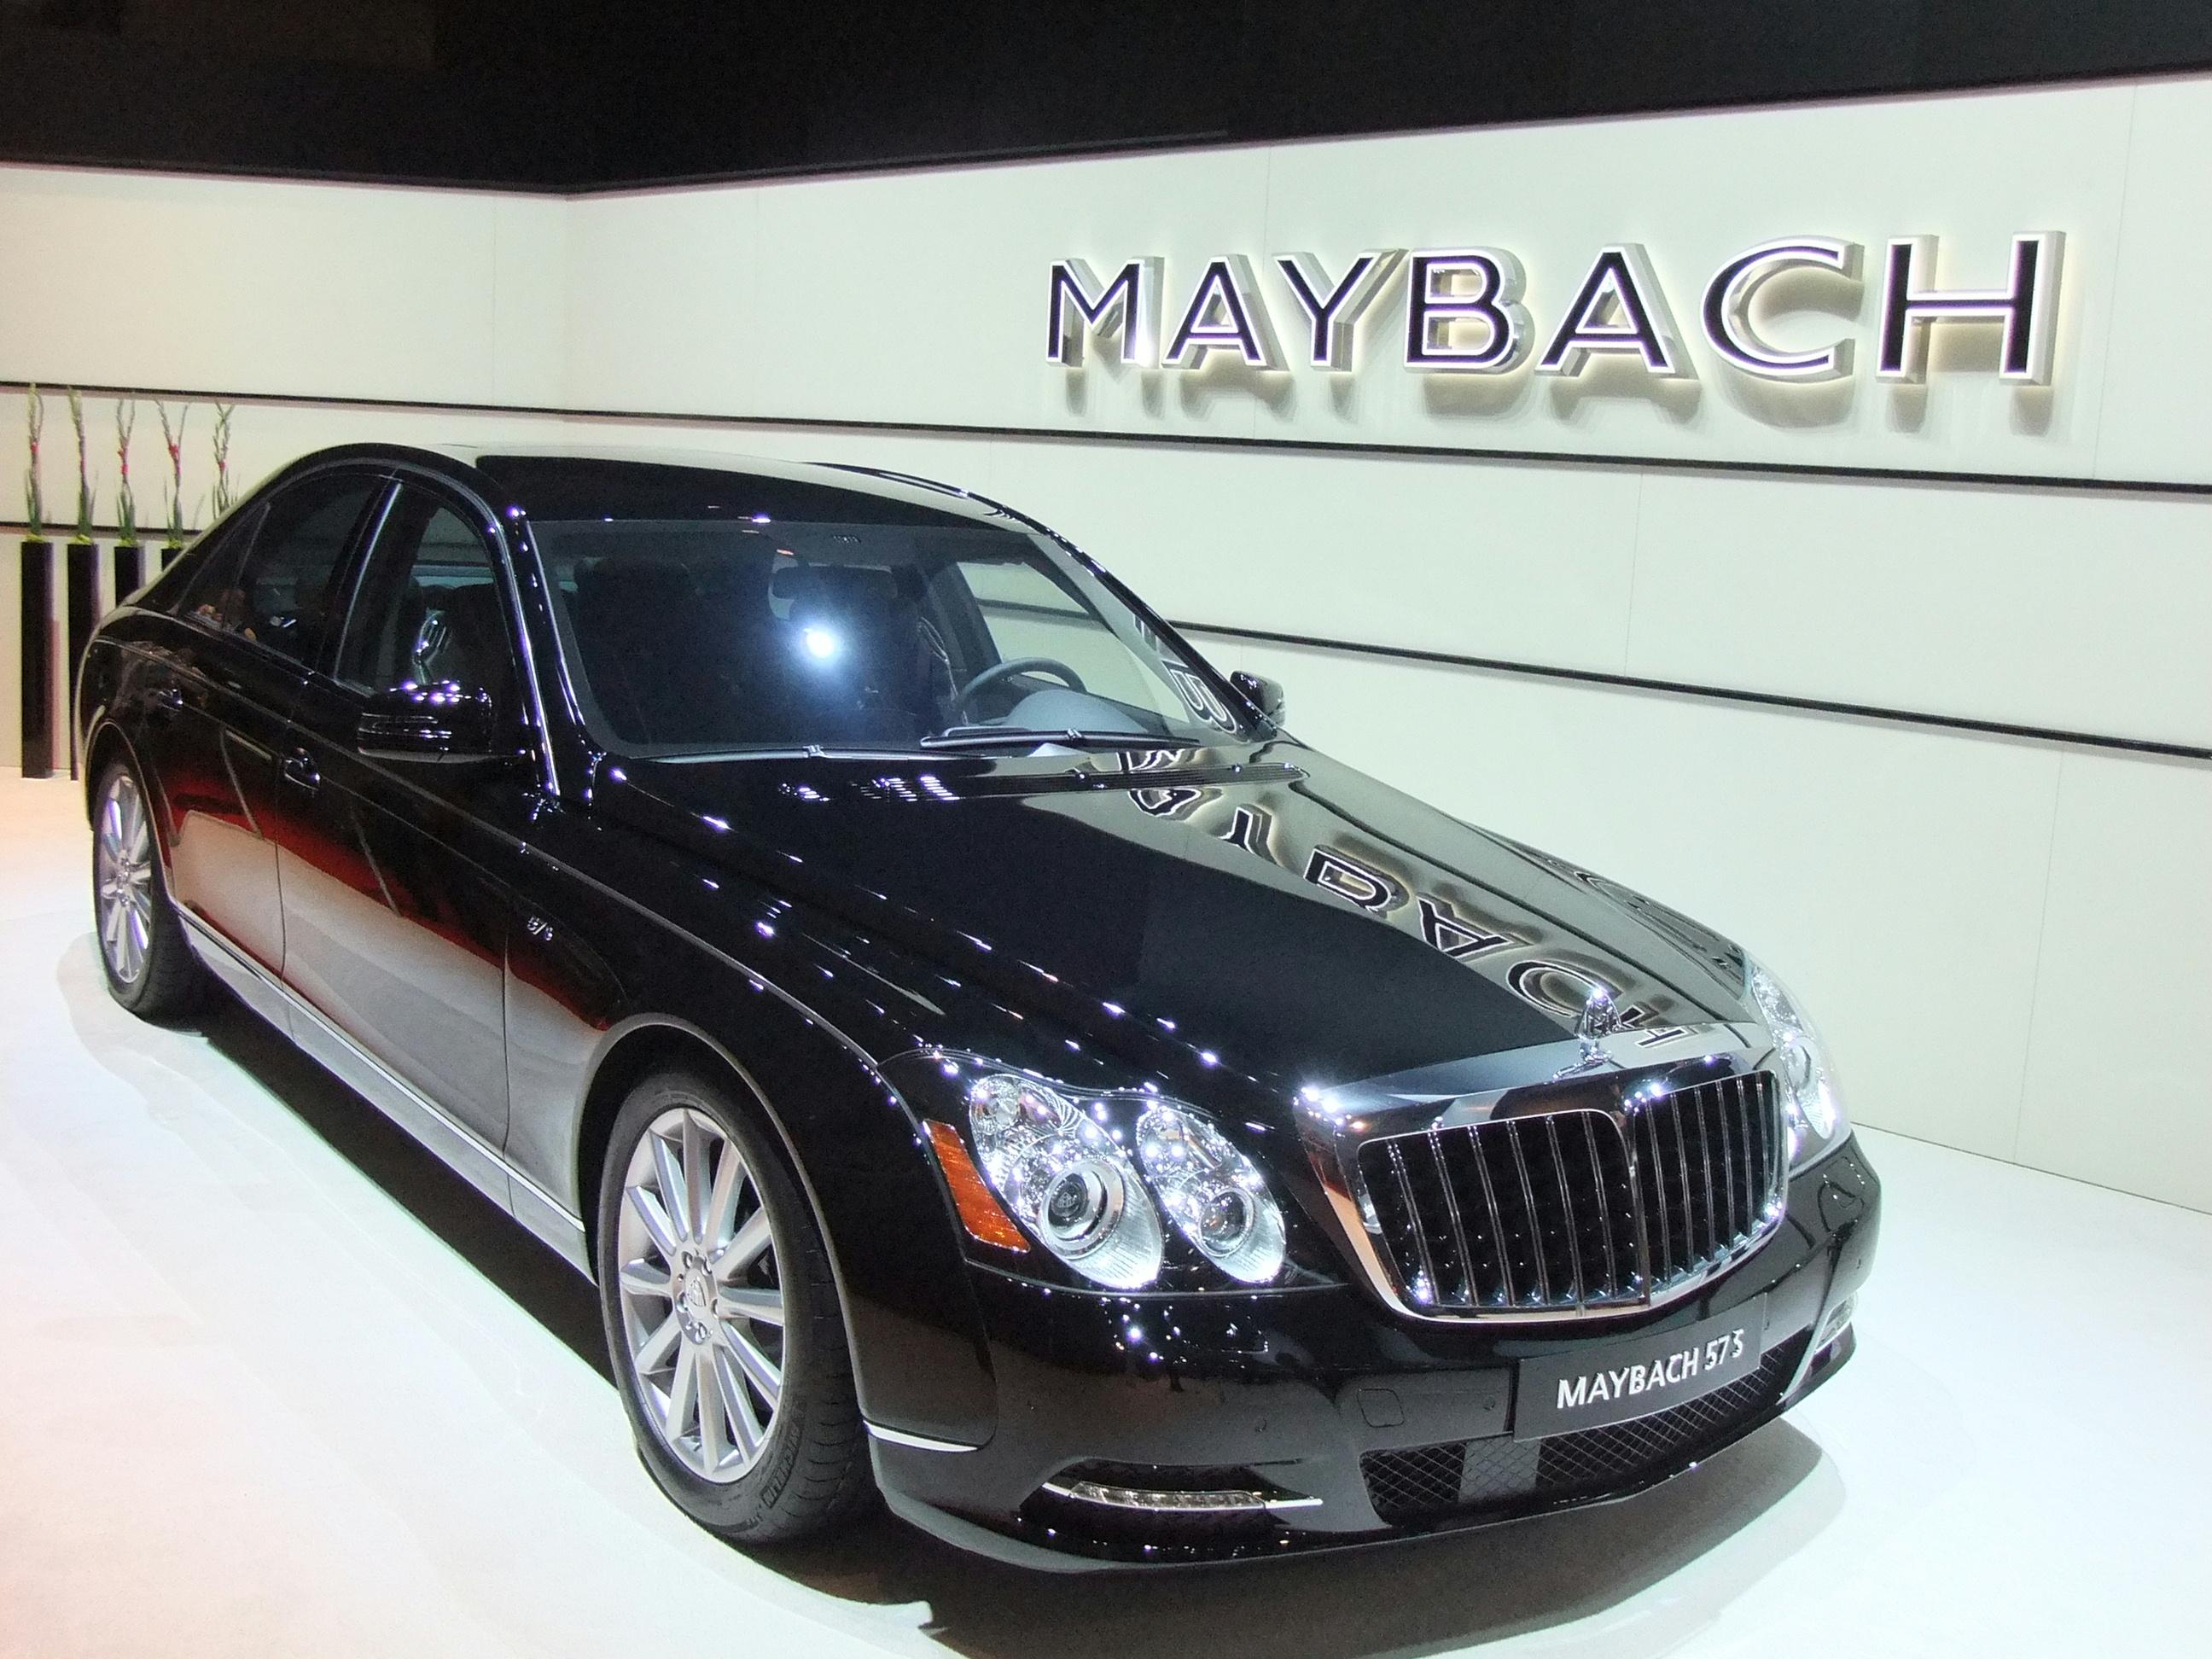 2011 maybach 57 13 maybach 57 13